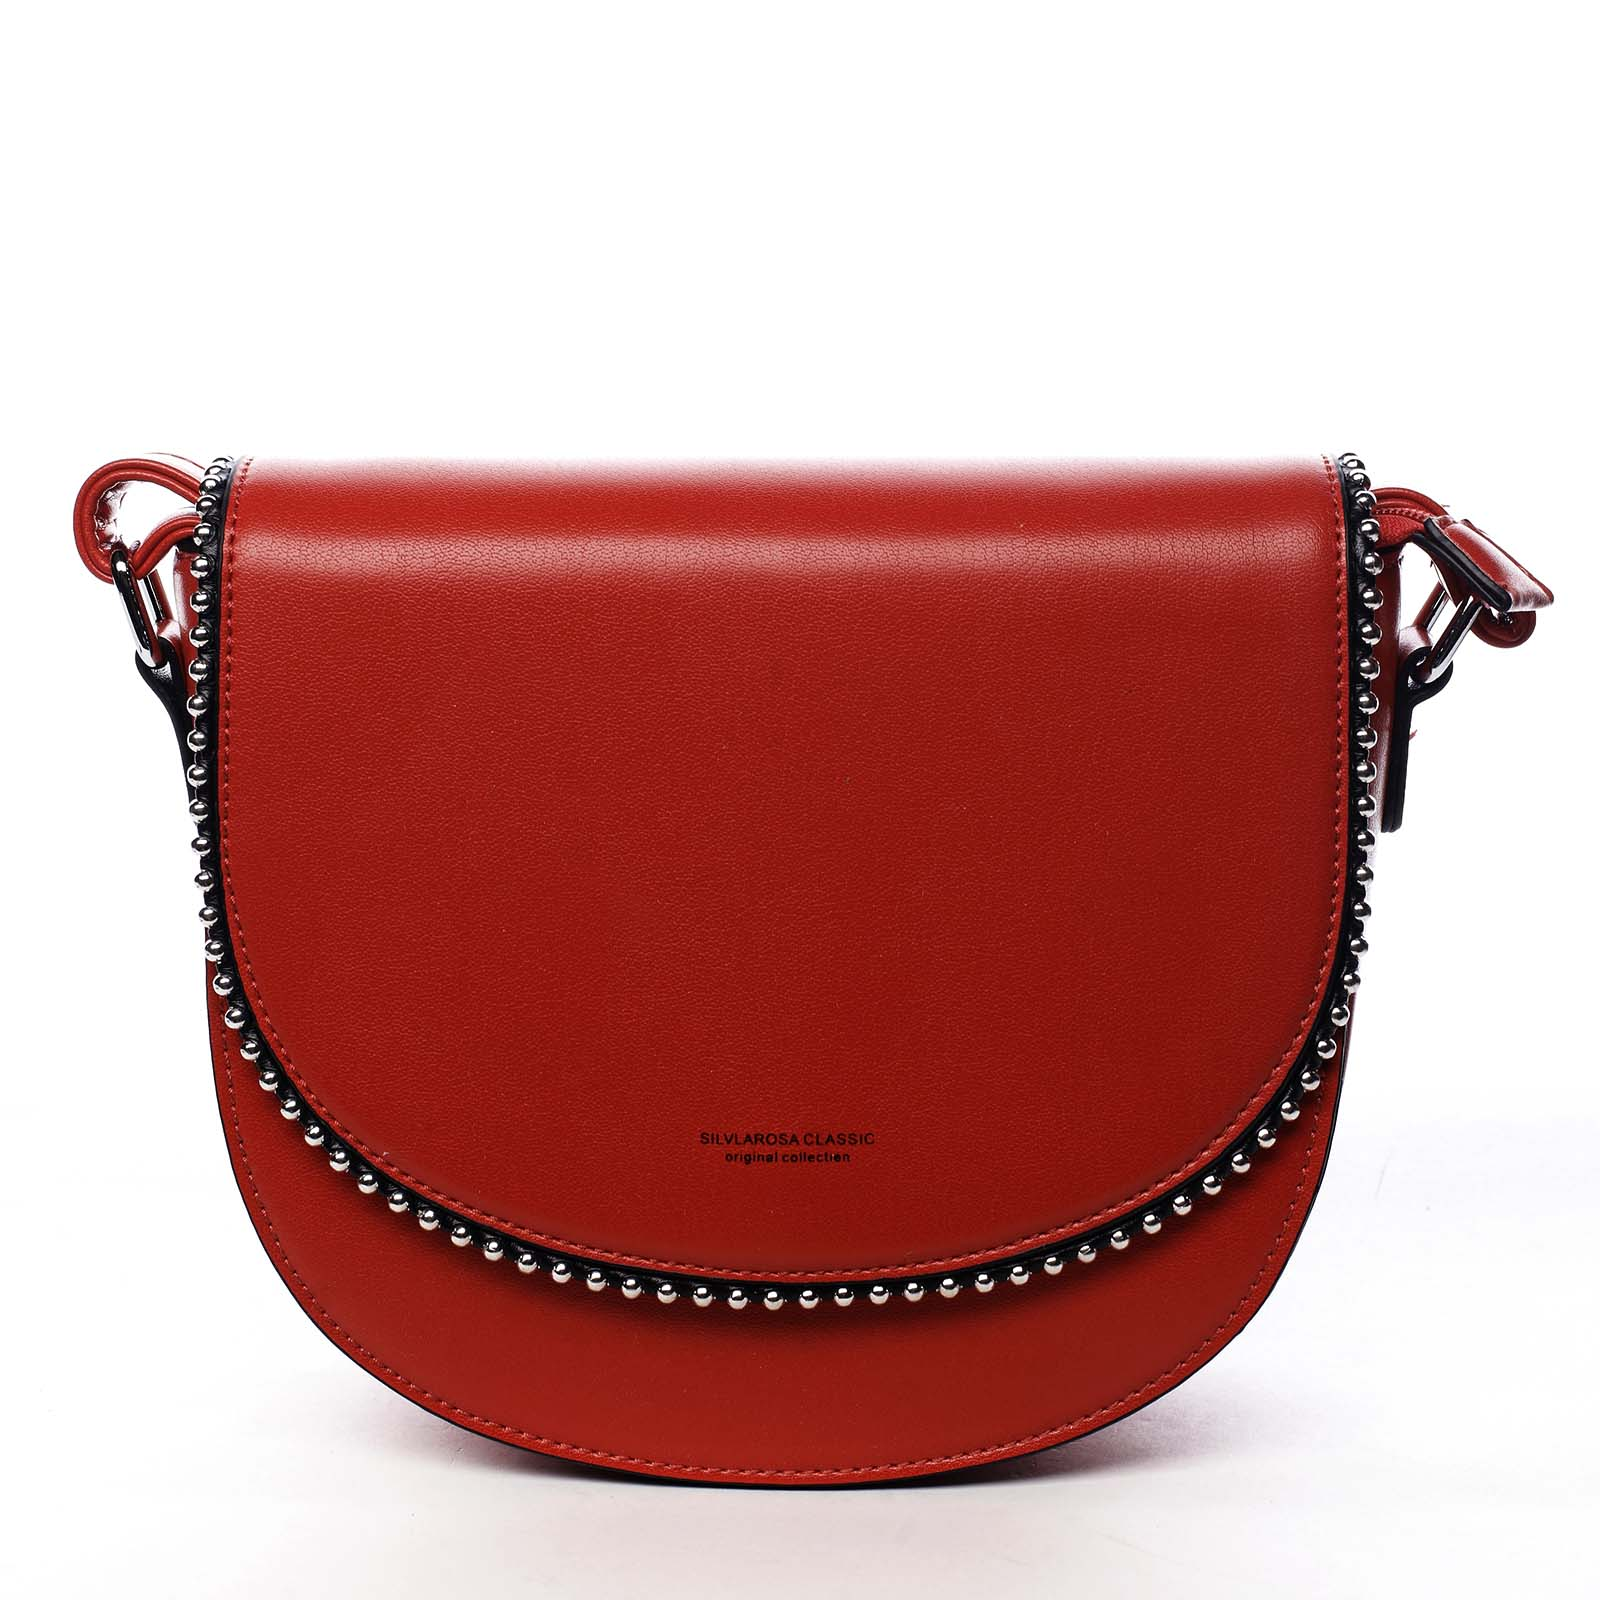 Dámská crossbody kabelka červená - Silvia Rosa Evolve